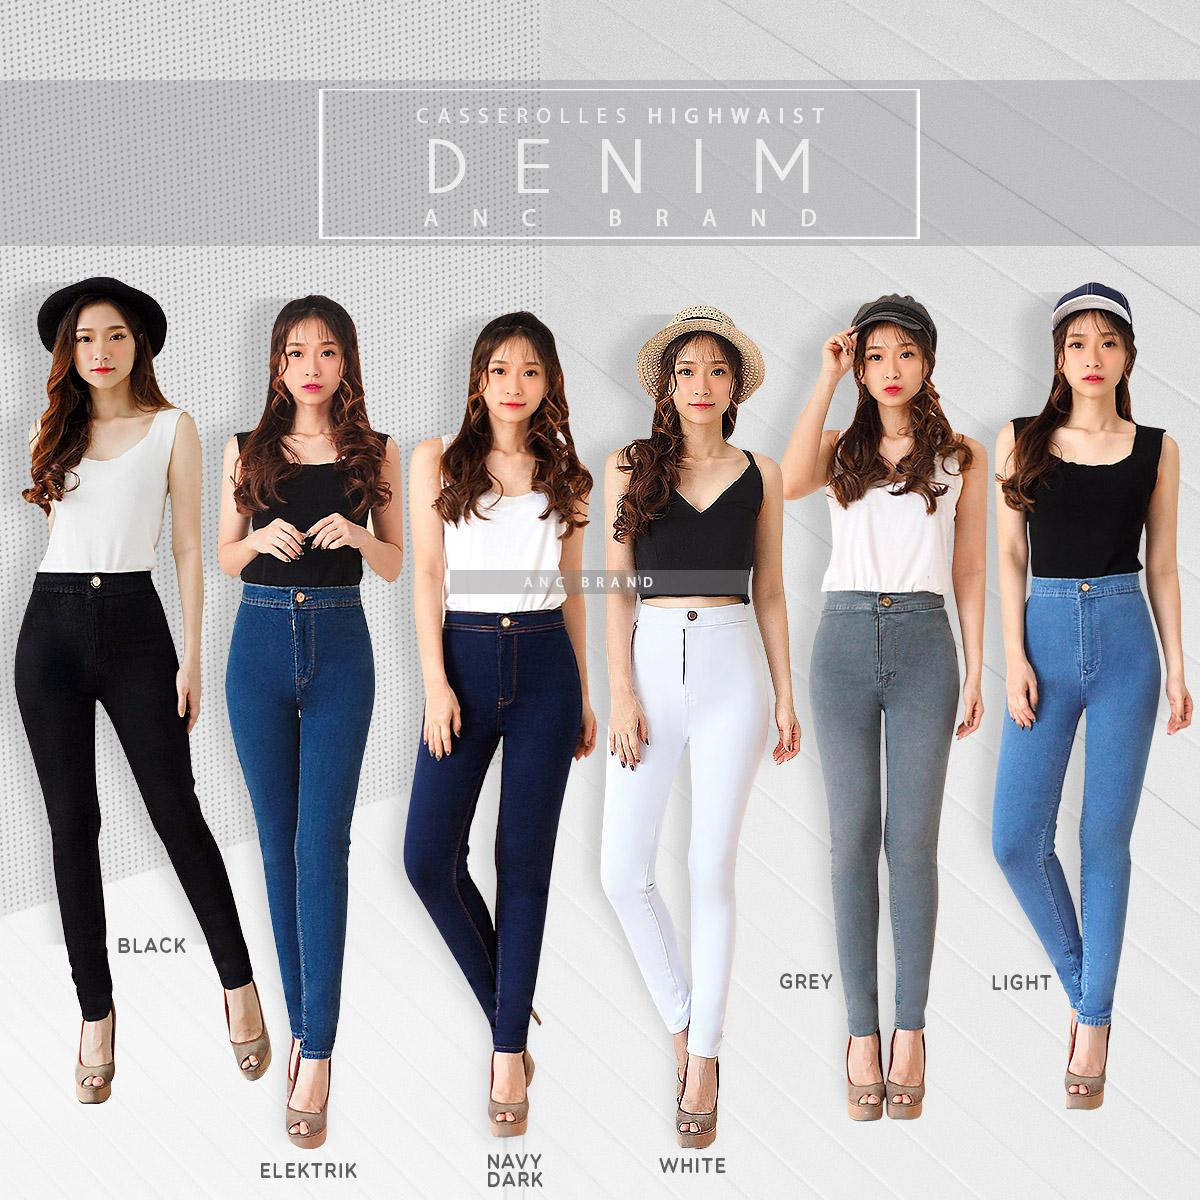 celana highwaist bow vv combi – (ready warna light medium acid) – fashion wanita   ancien store